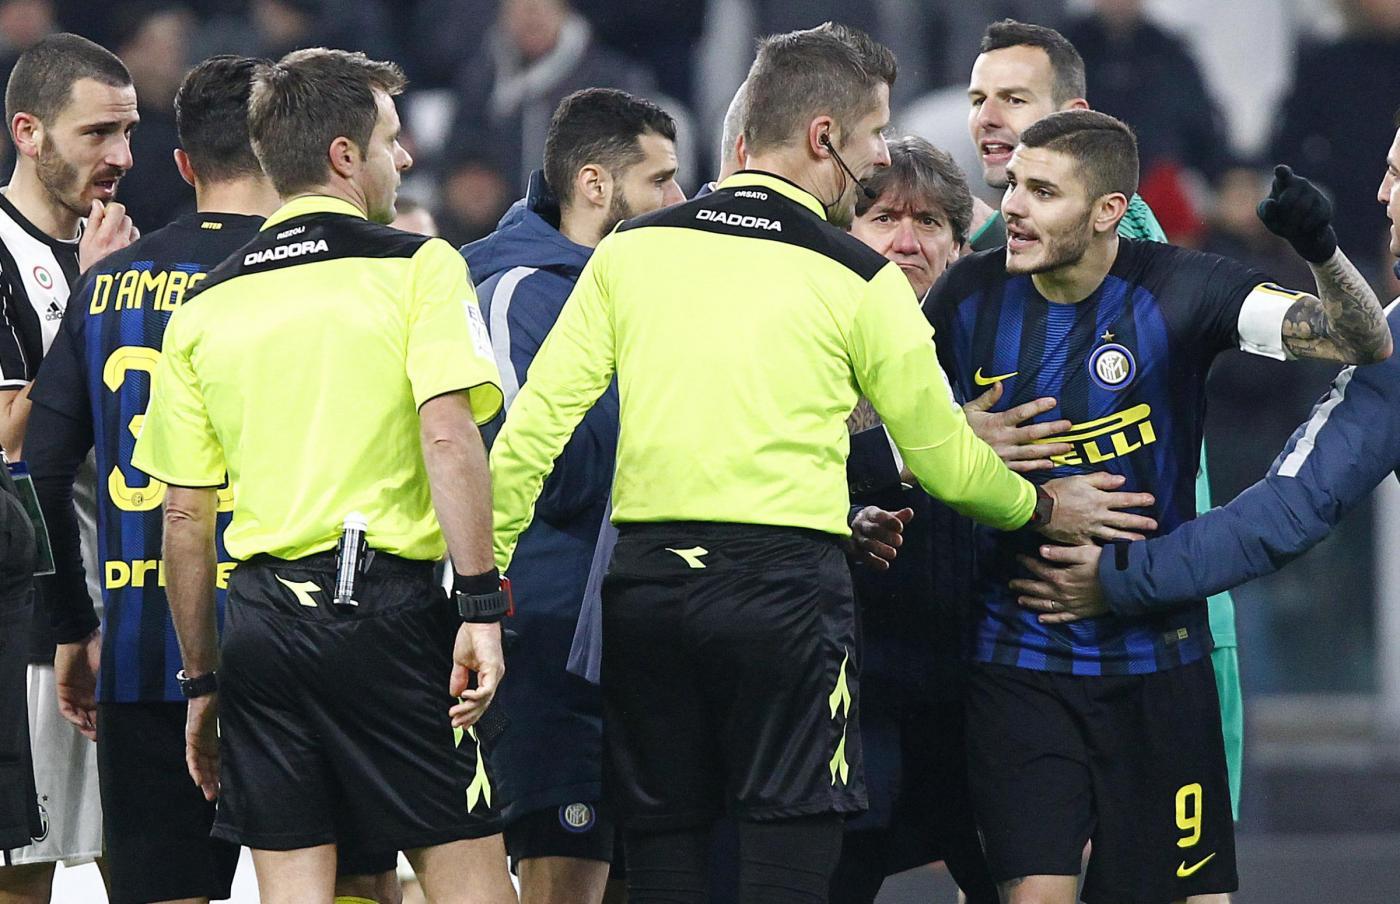 Juve-Inter, Sconcerti sbotta: